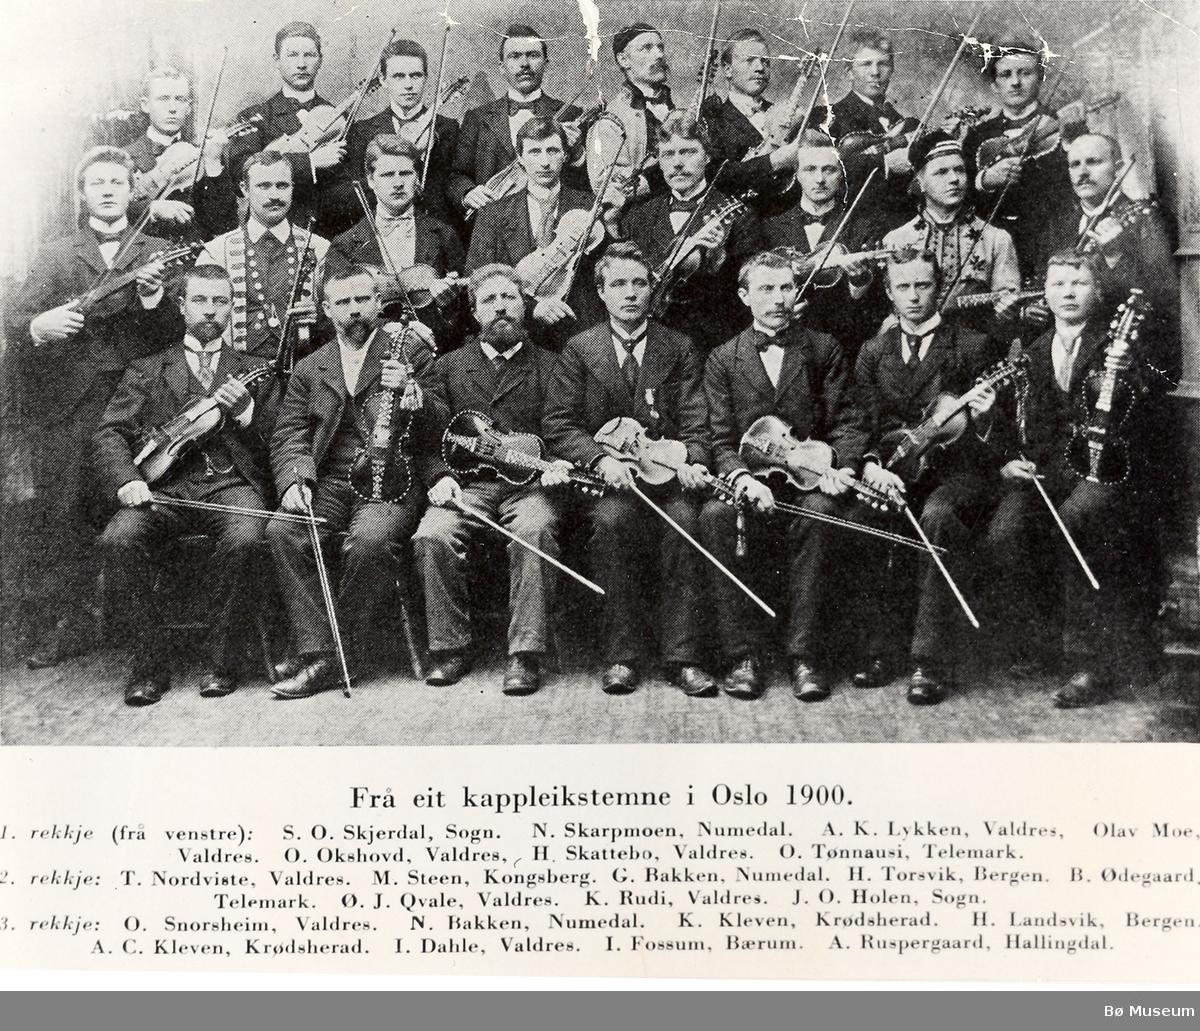 harFrå eit kappleikstevne i Oslo 1900